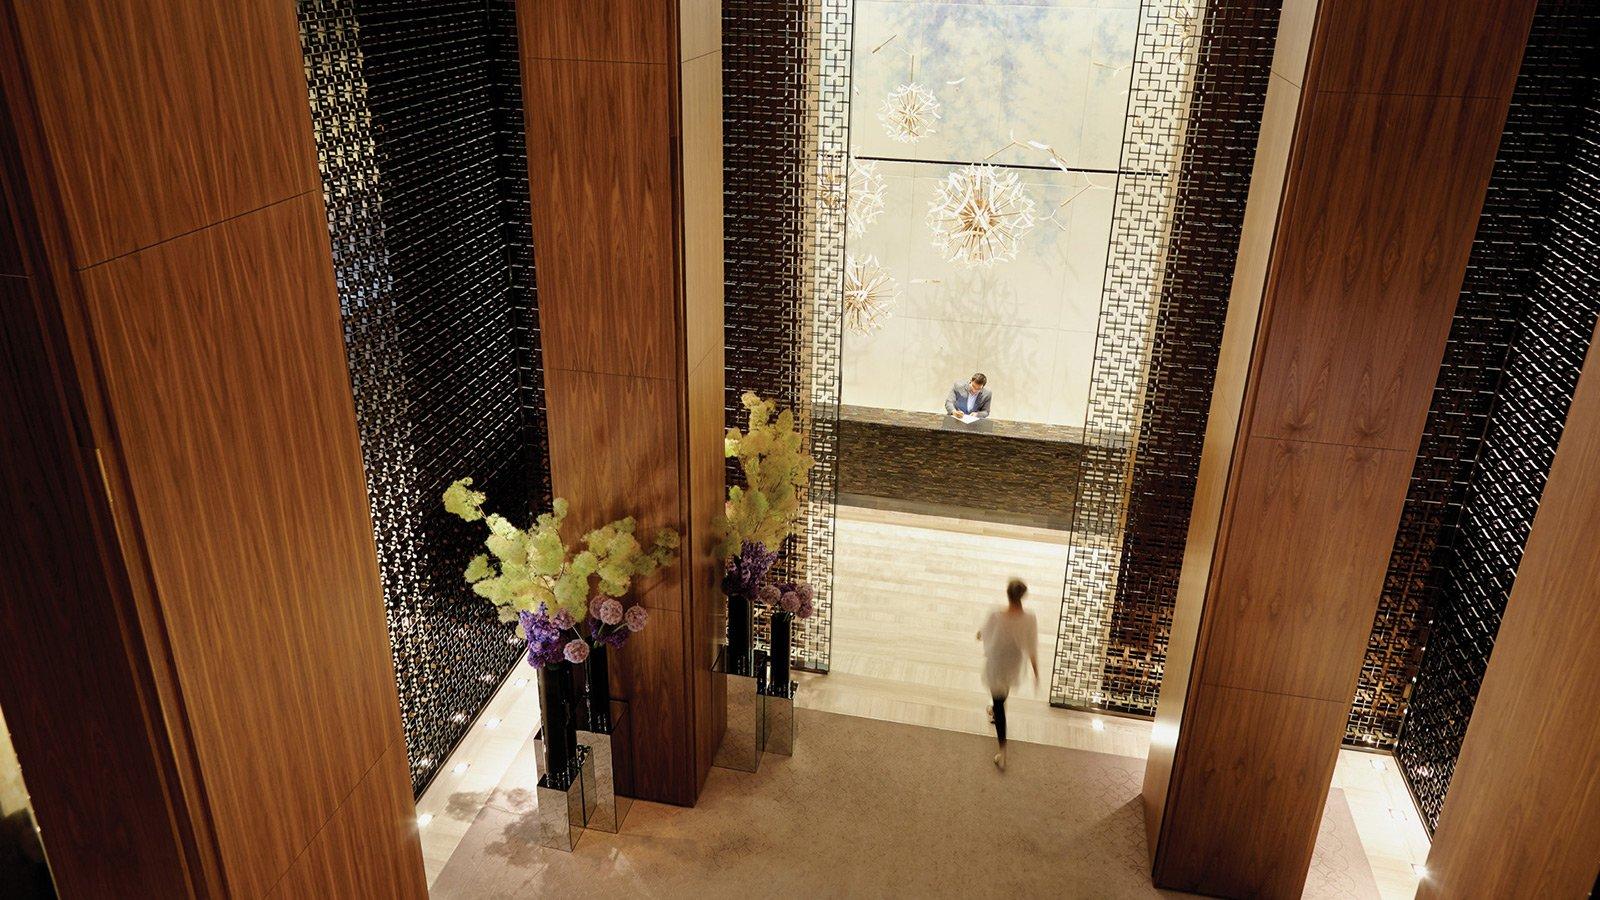 Four Seasons Toronto Bamboo/Asian fusion massage